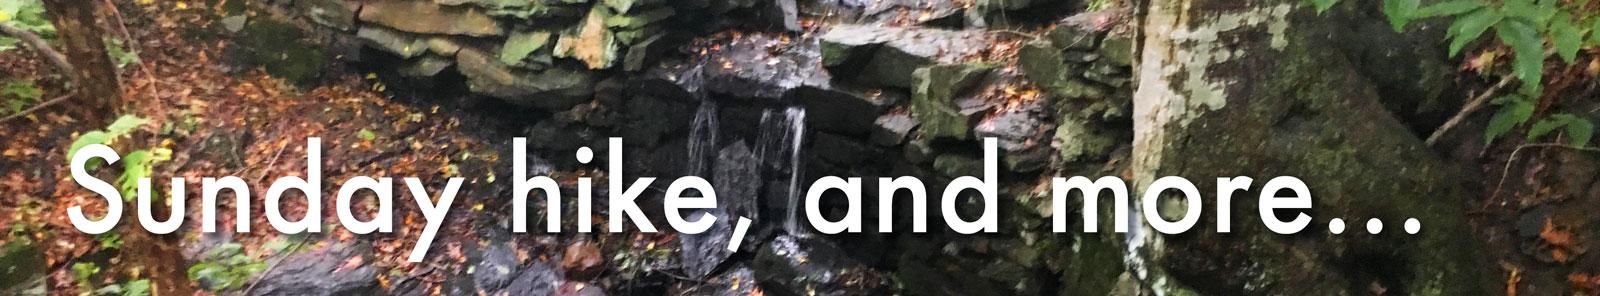 hike-header.jpg